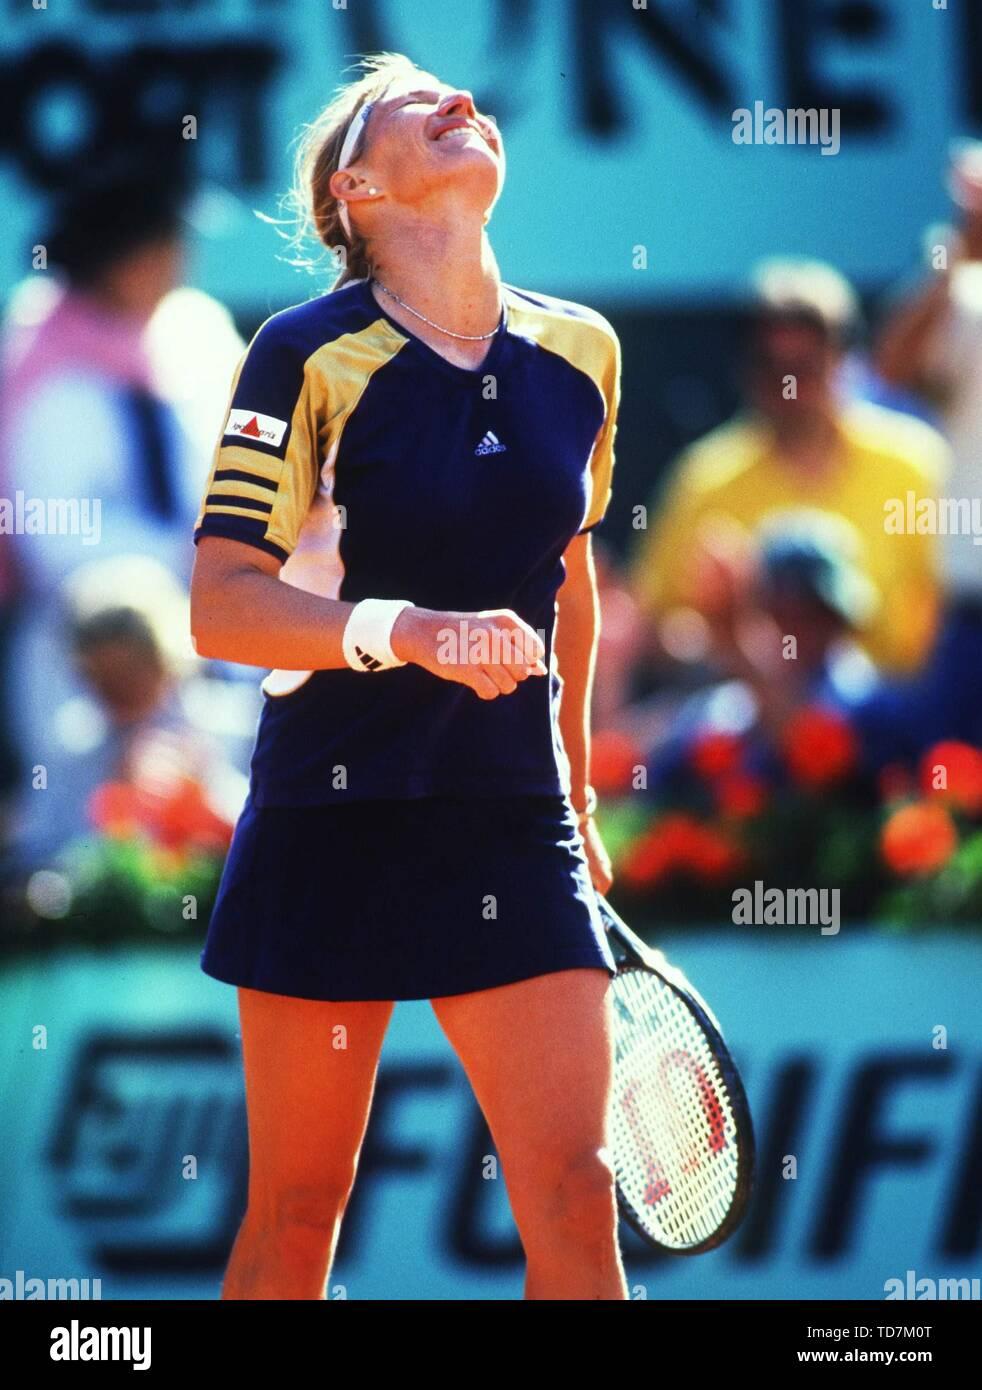 Paris, Frankreich. 10th Sep, 2015. Tennis: Paris French Open 05/1999 Steffi Stefanie Steffanie Graf Final Roland Garros jubilation on her 22 Grand Slam title | usage worldwide Credit: dpa/Alamy Live News - Stock Image